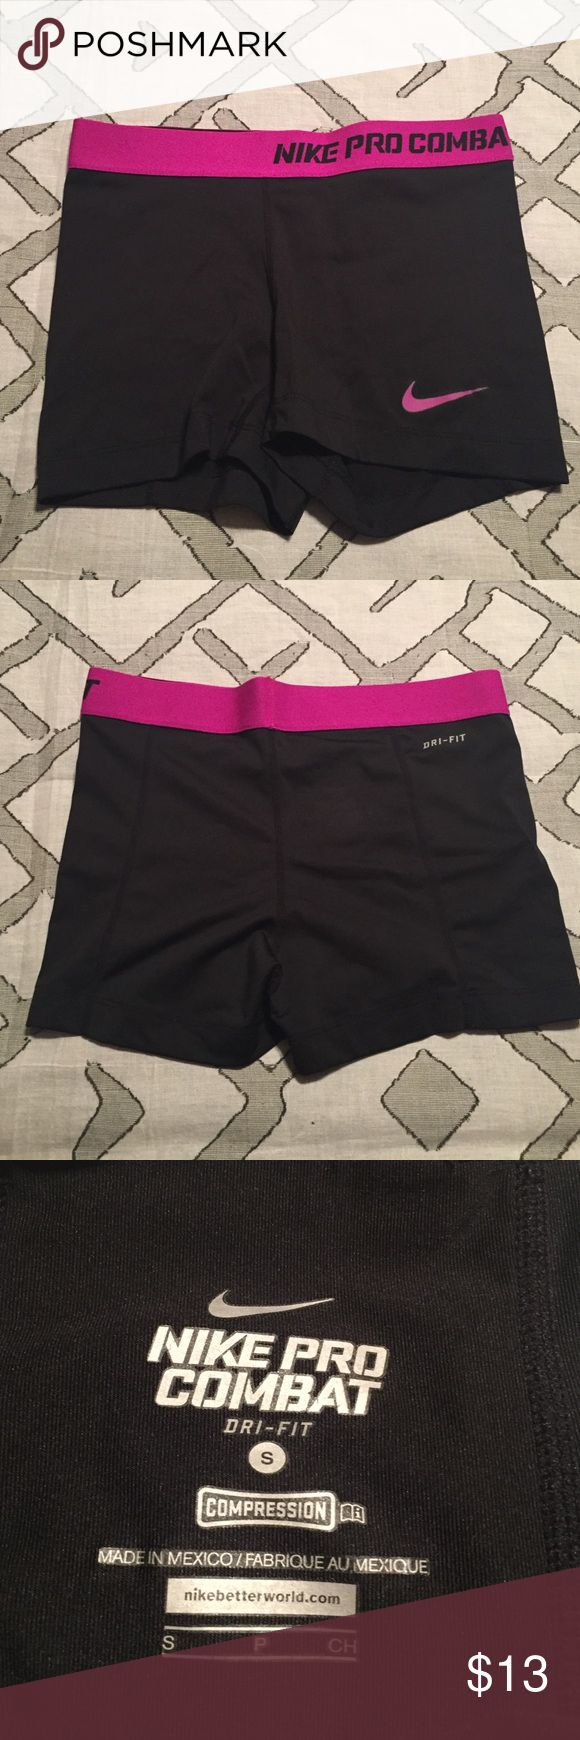 Nike Pro Combat Shorts Splash of color, never worn, Nike Pro Combat Shorts. Perfect for working out in style! Nike Shorts